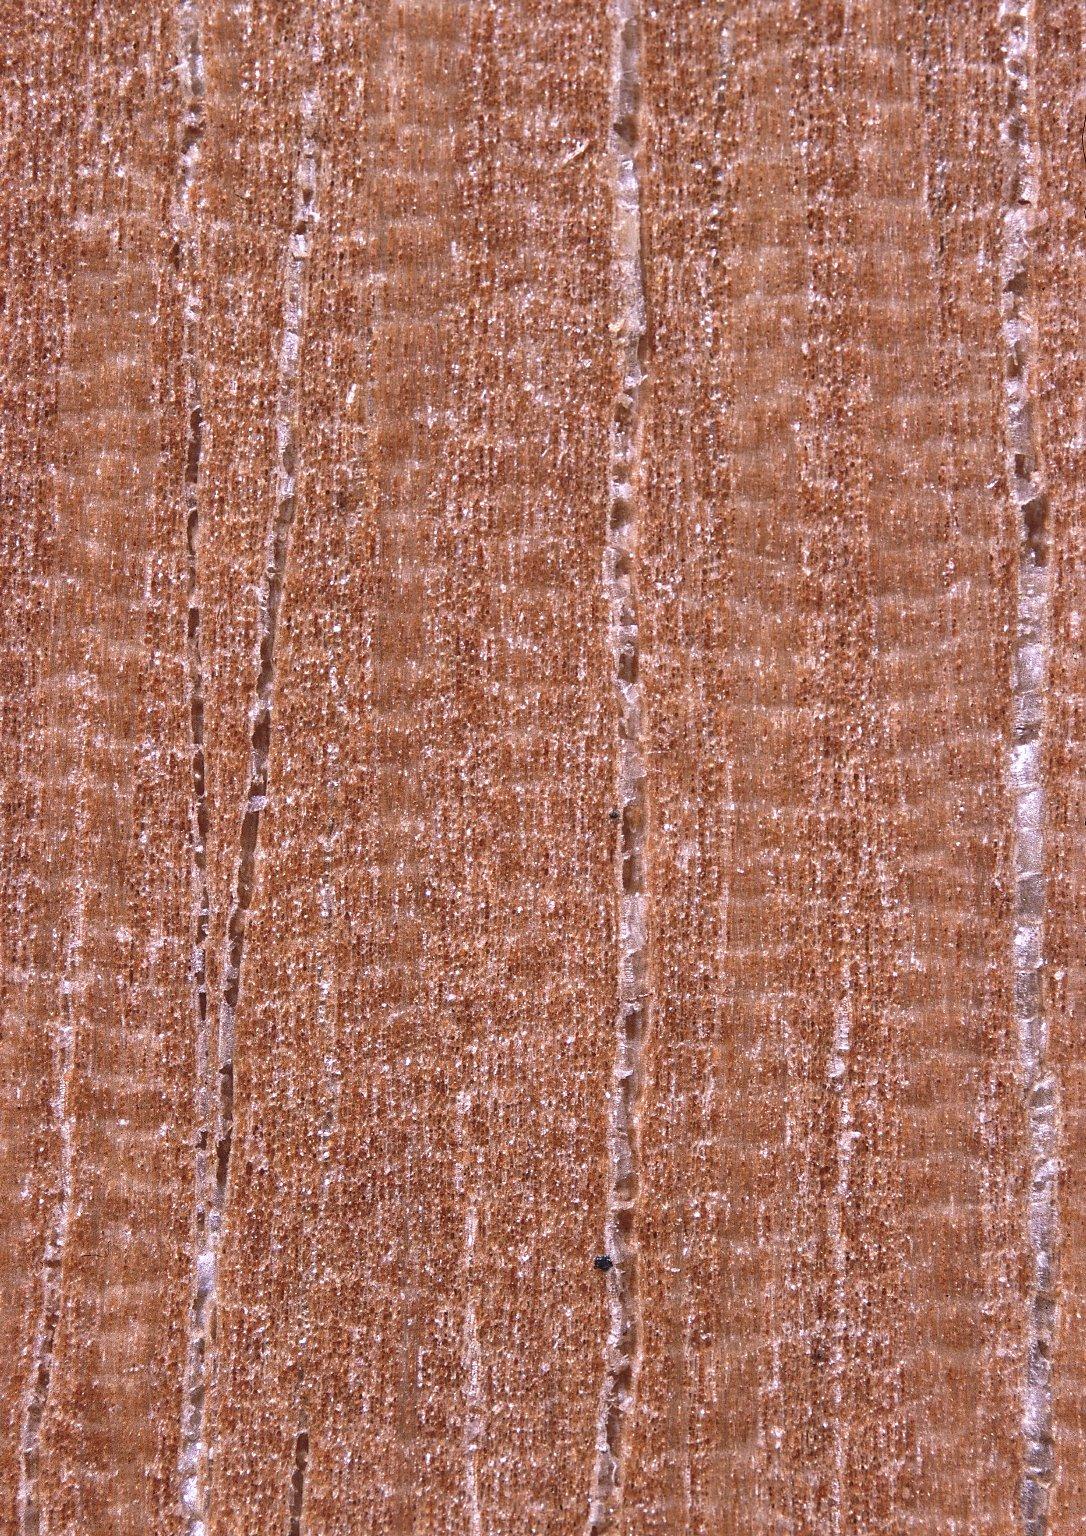 LEGUMINOSAE CAESALPINIOIDEAE Bauhinia thonningii